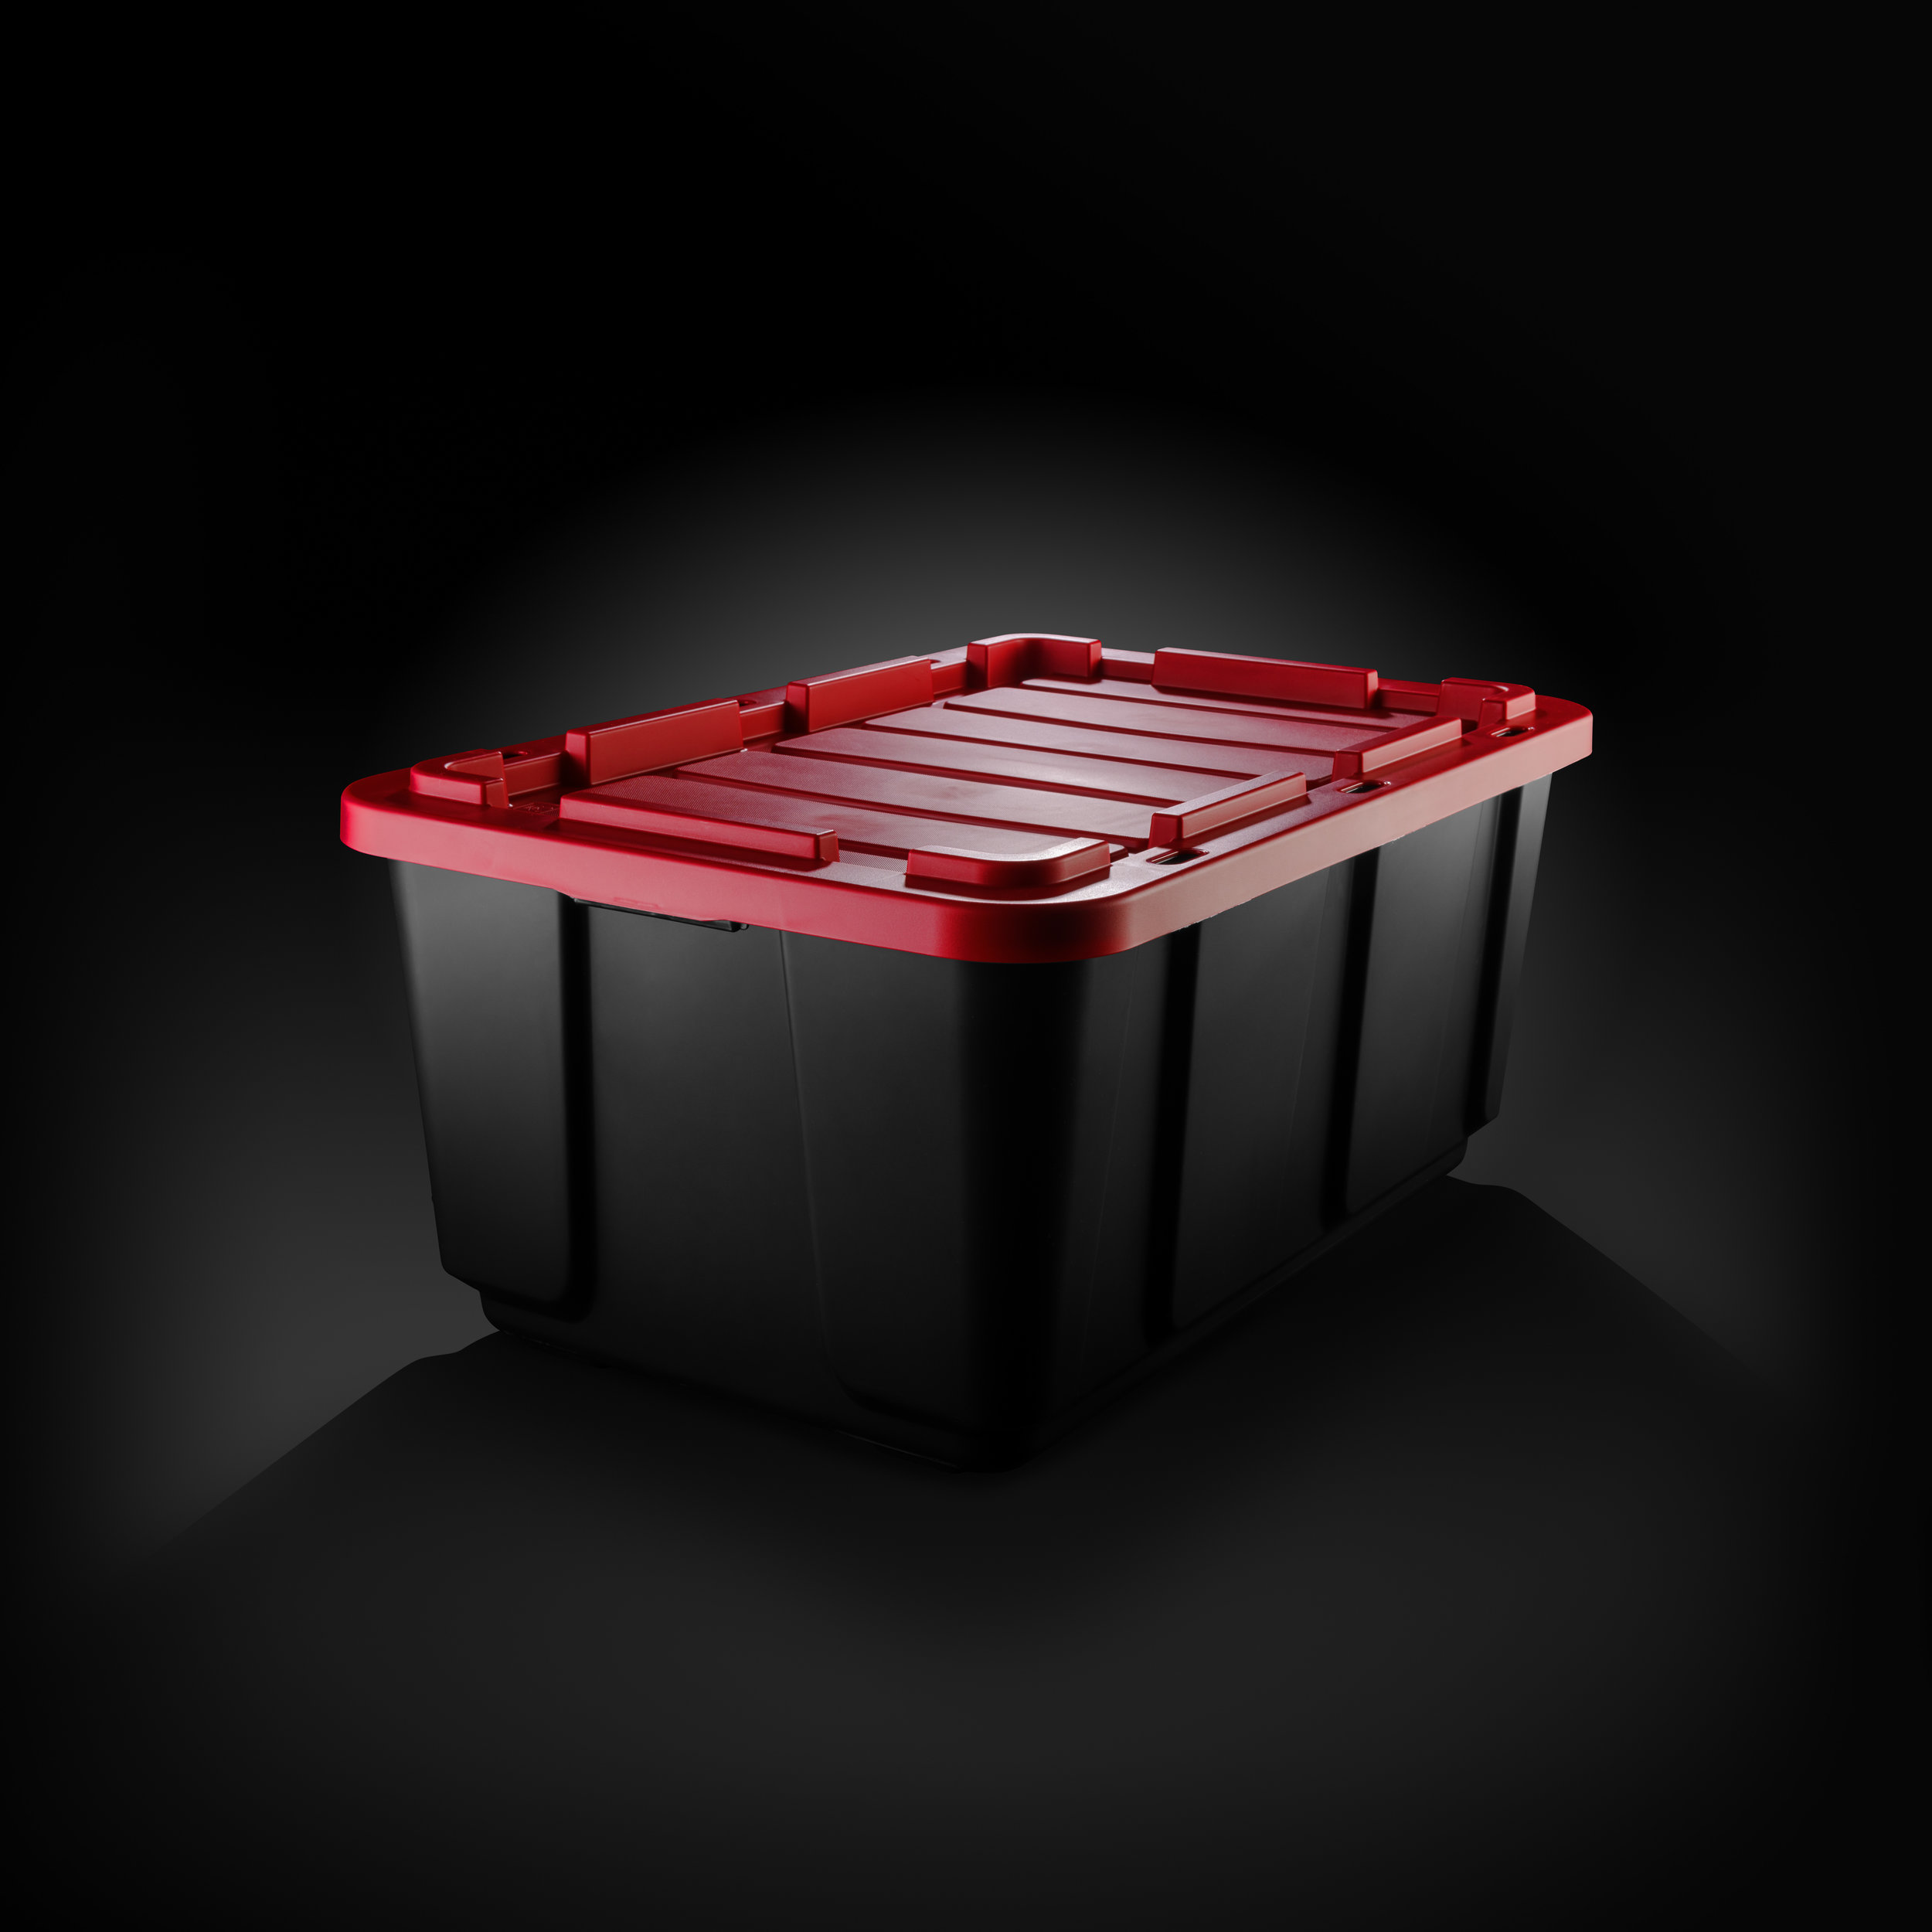 UTB-27_Black-Red_Cool1.jpg